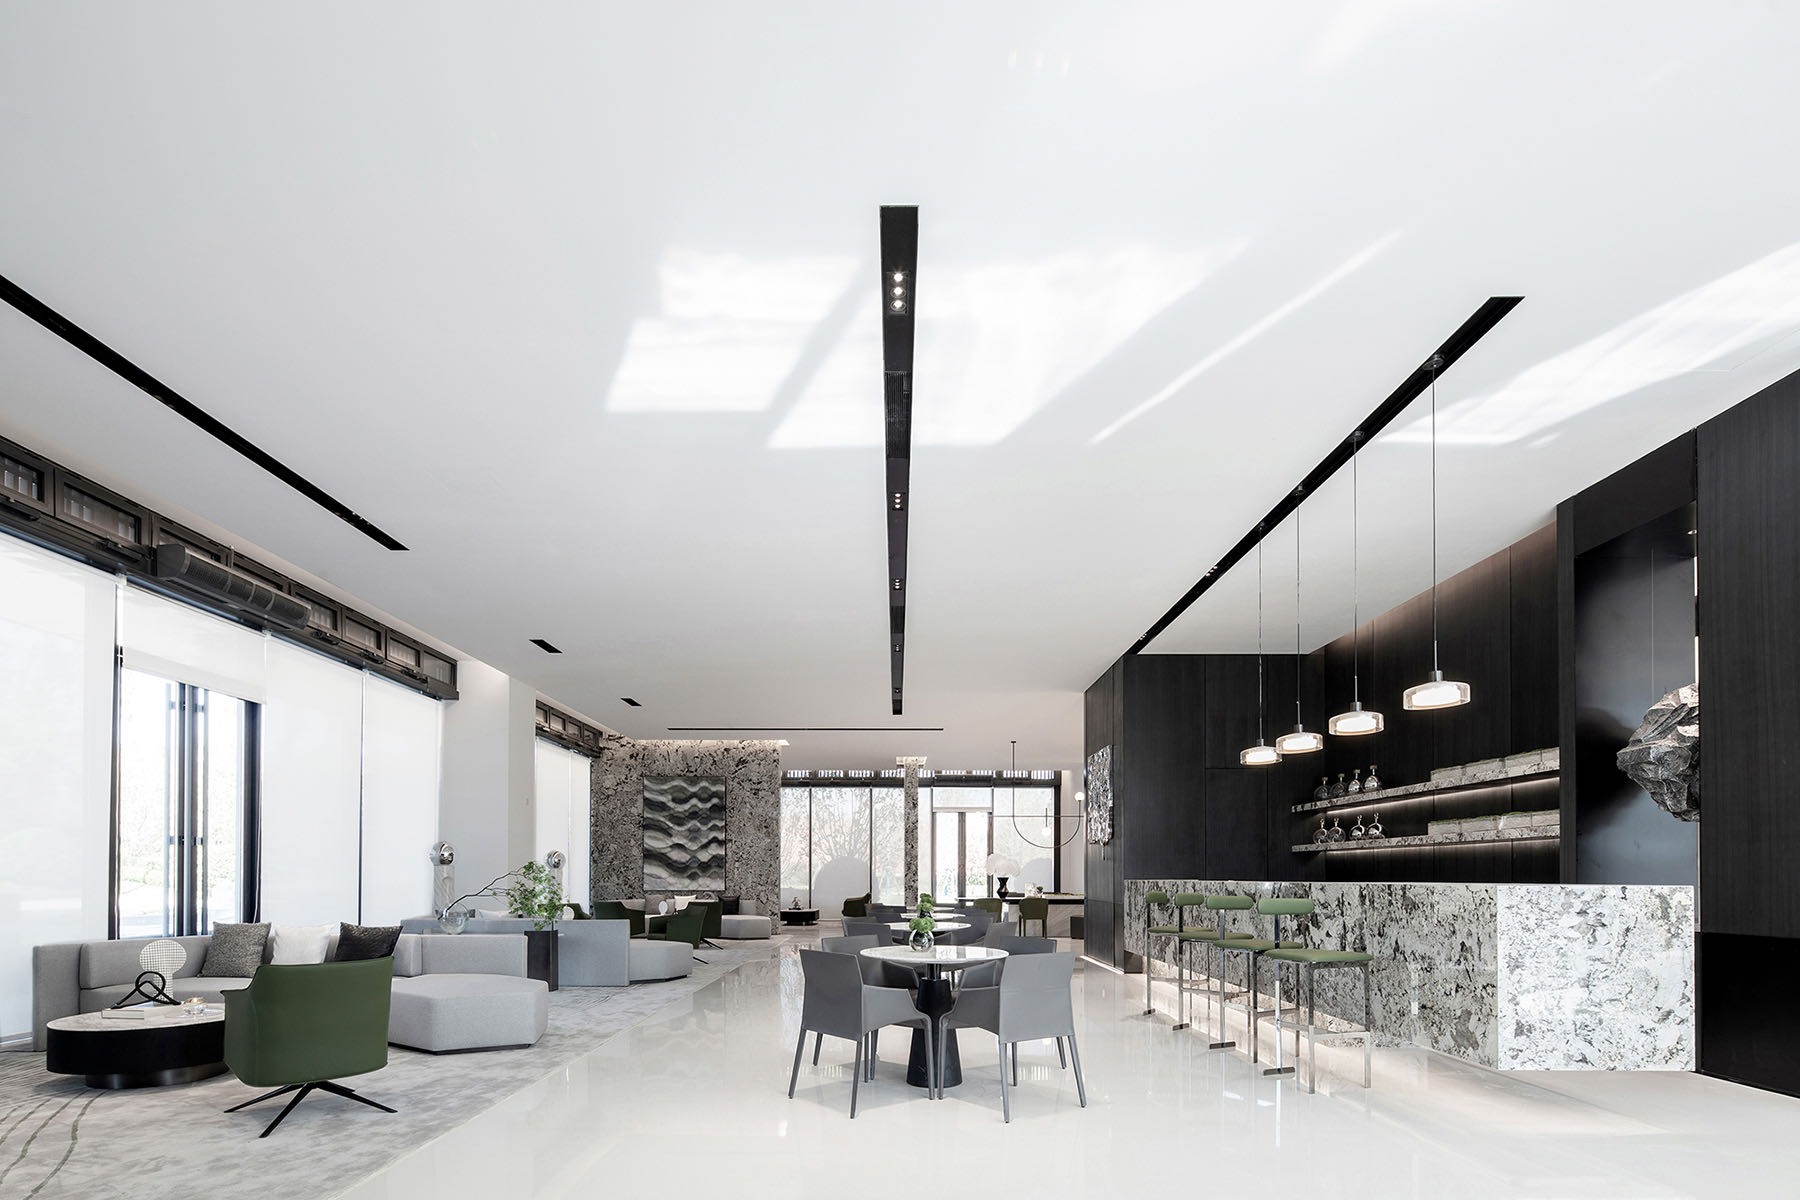 A Tour Of Sunac's Minimalist New Taiyuan Office